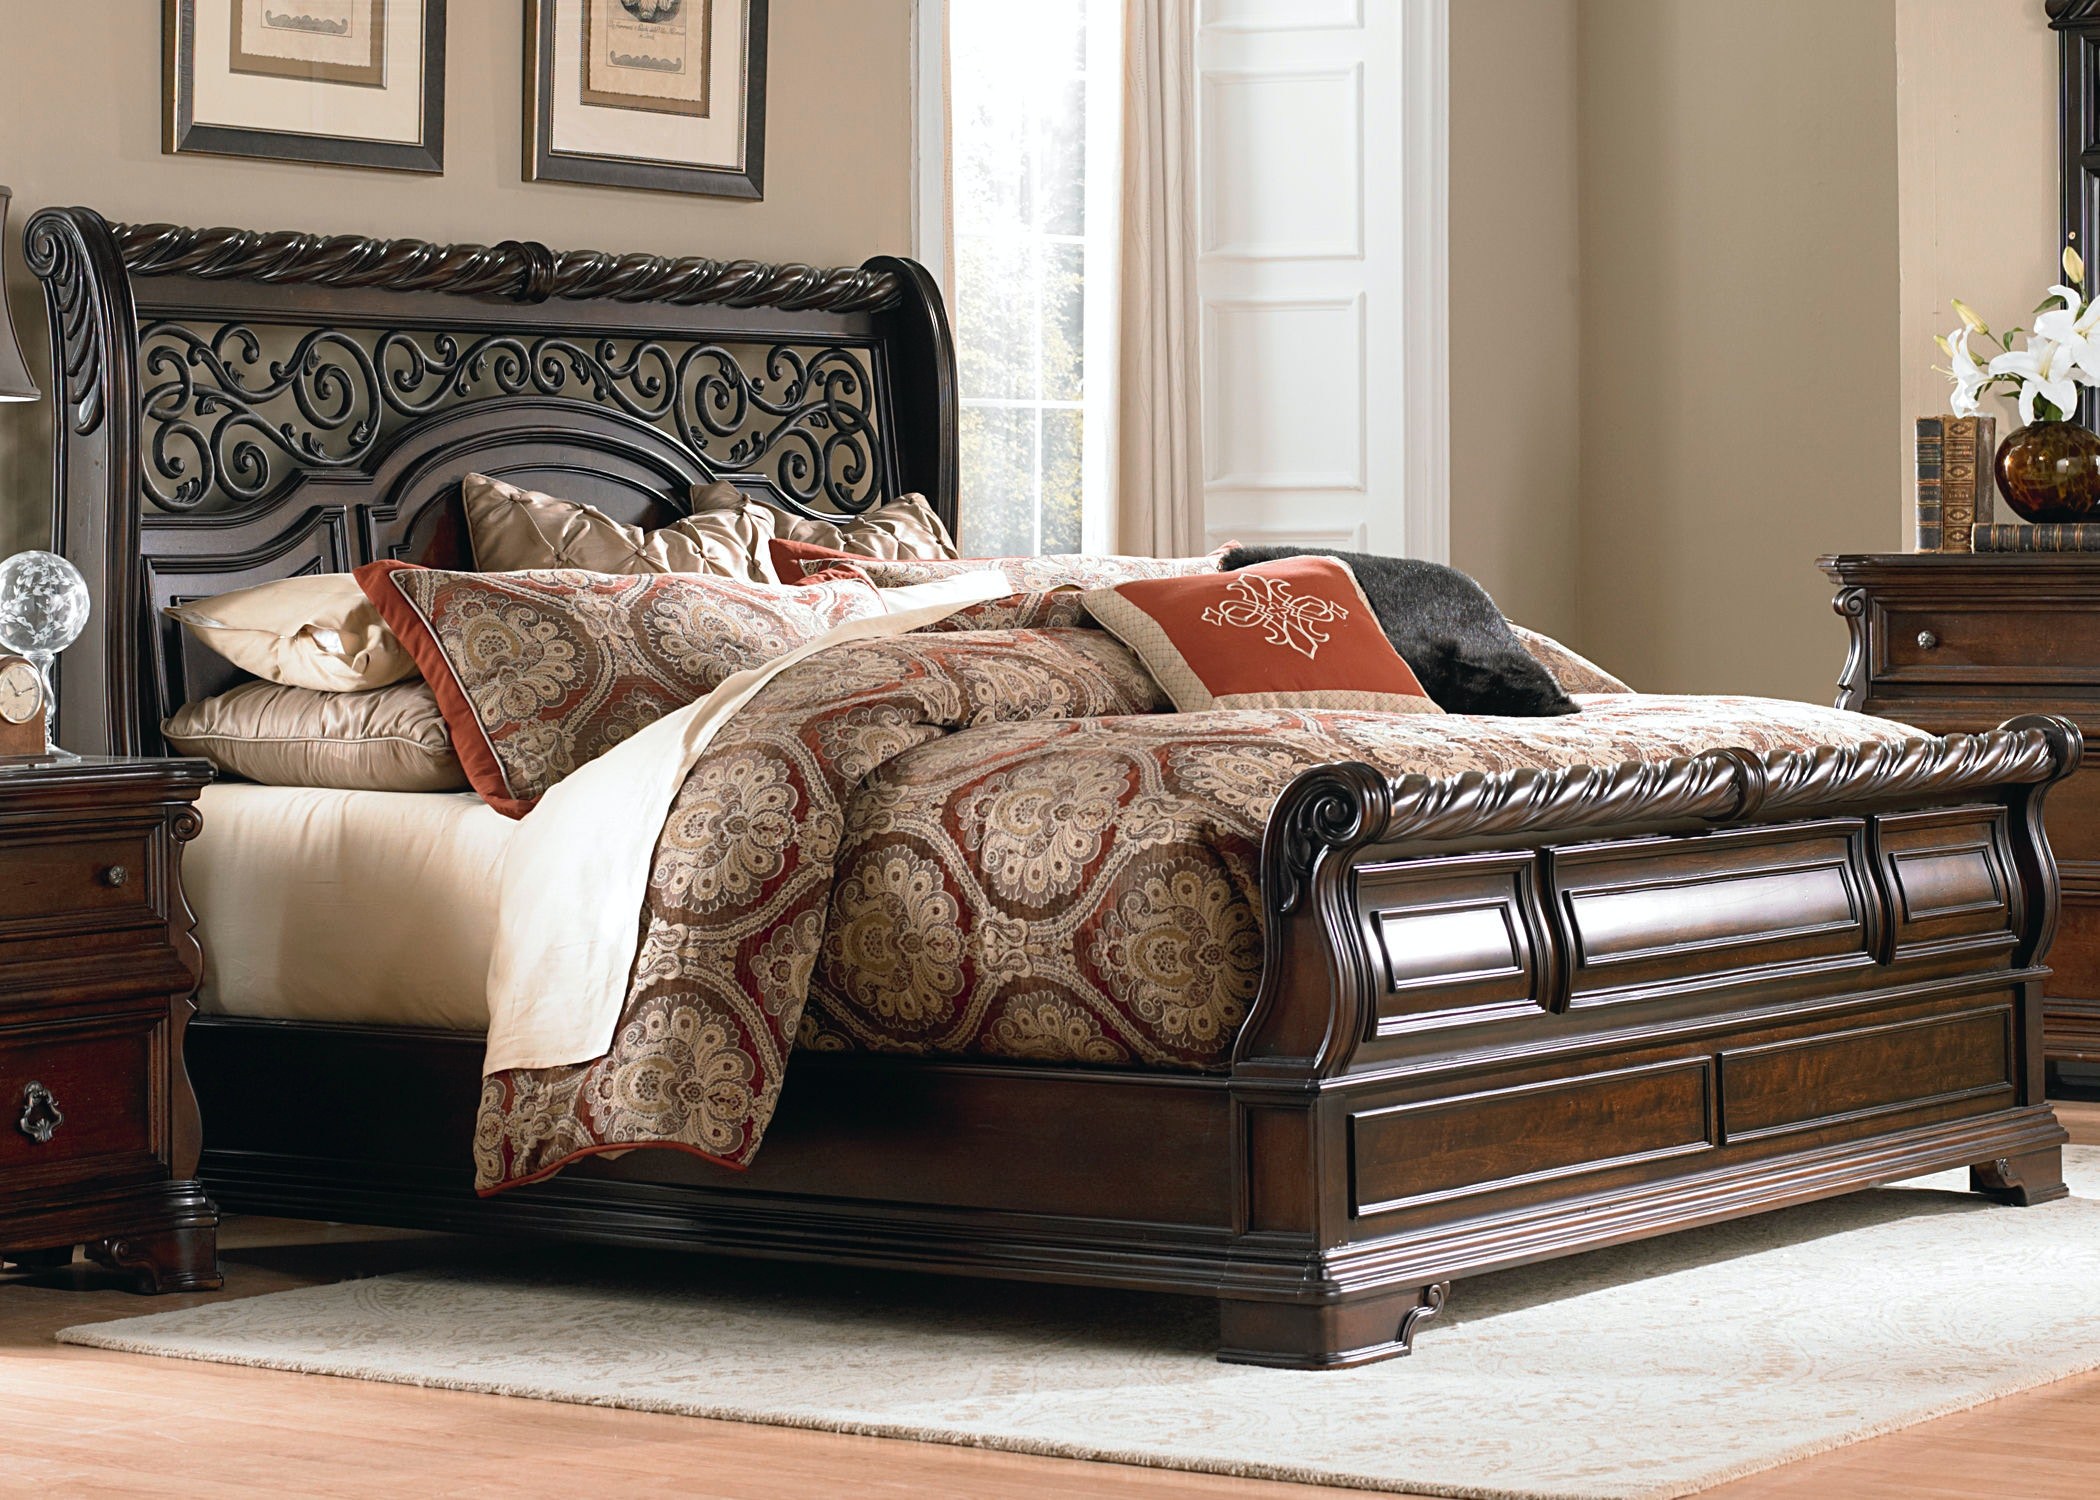 - Liberty Furniture Bedroom King Sleigh Bed 575-BR-KSL - Good's